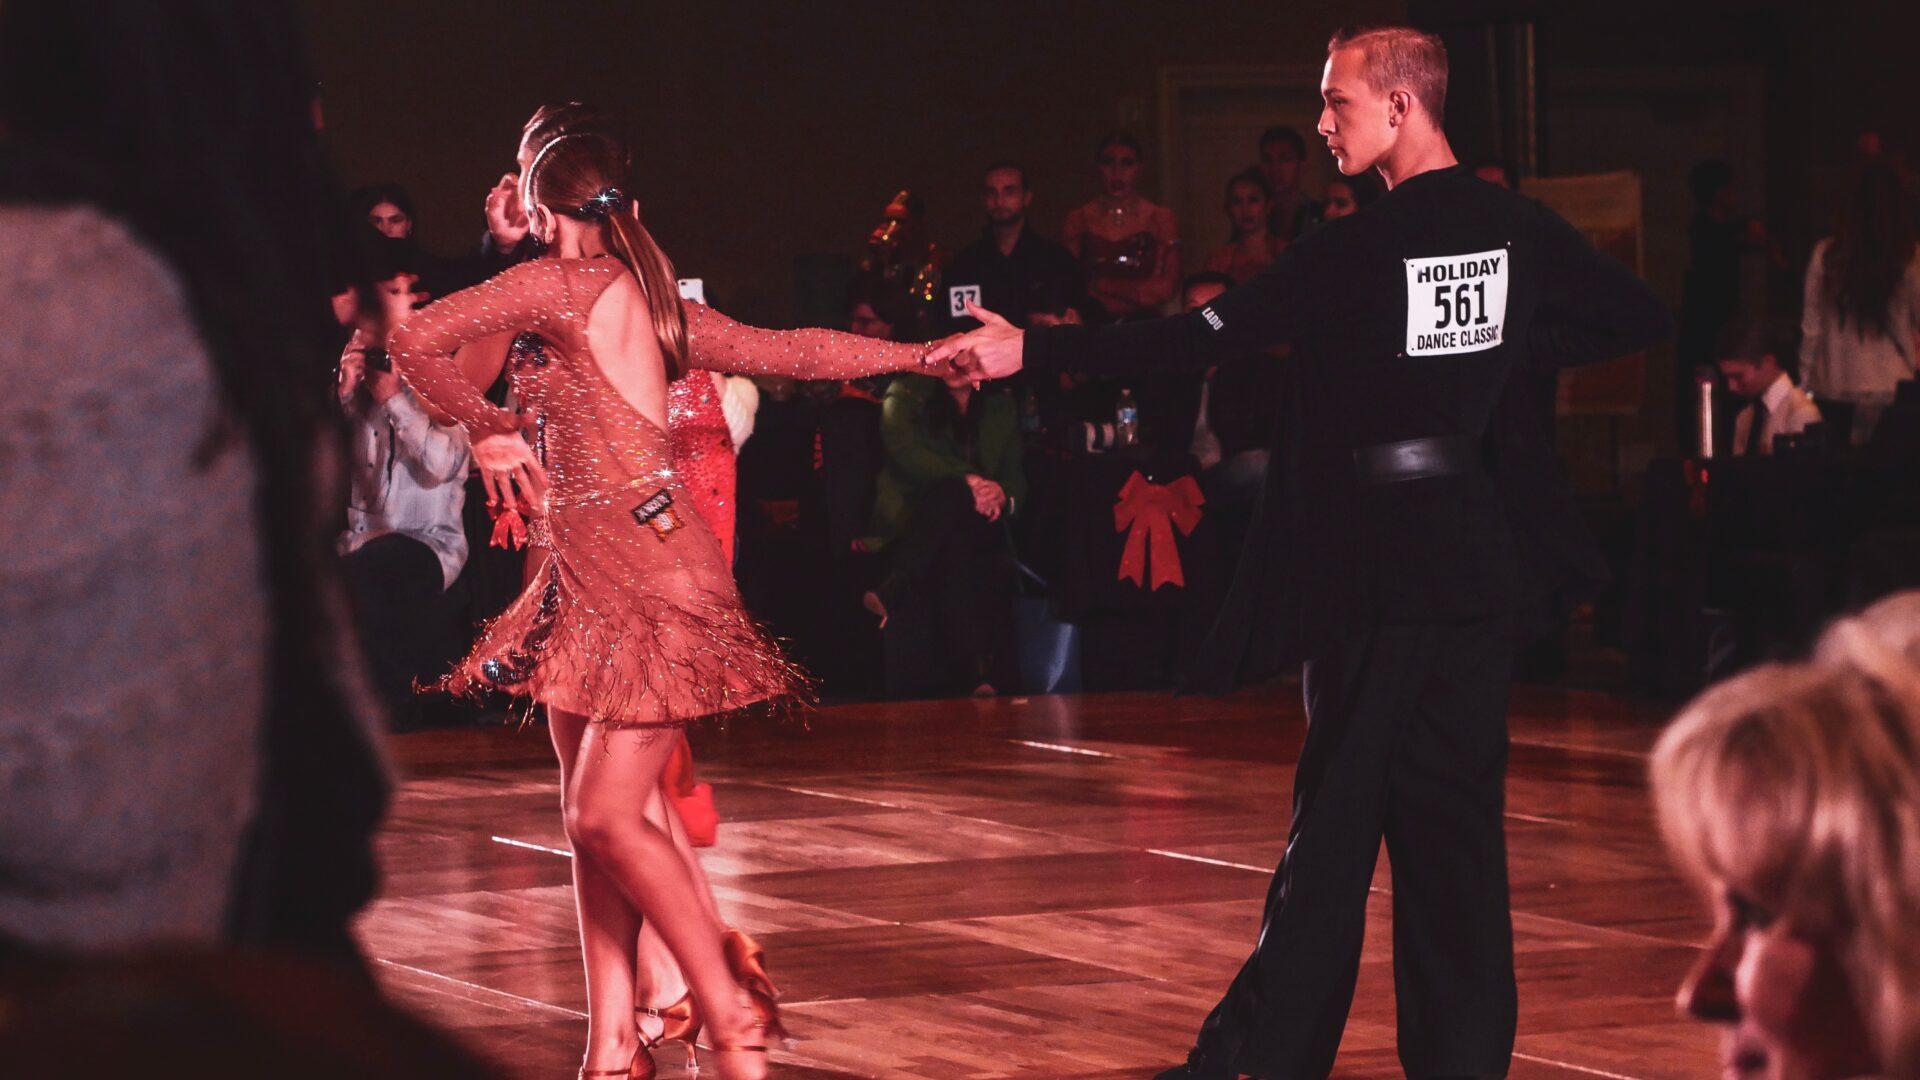 National Dance Clubs